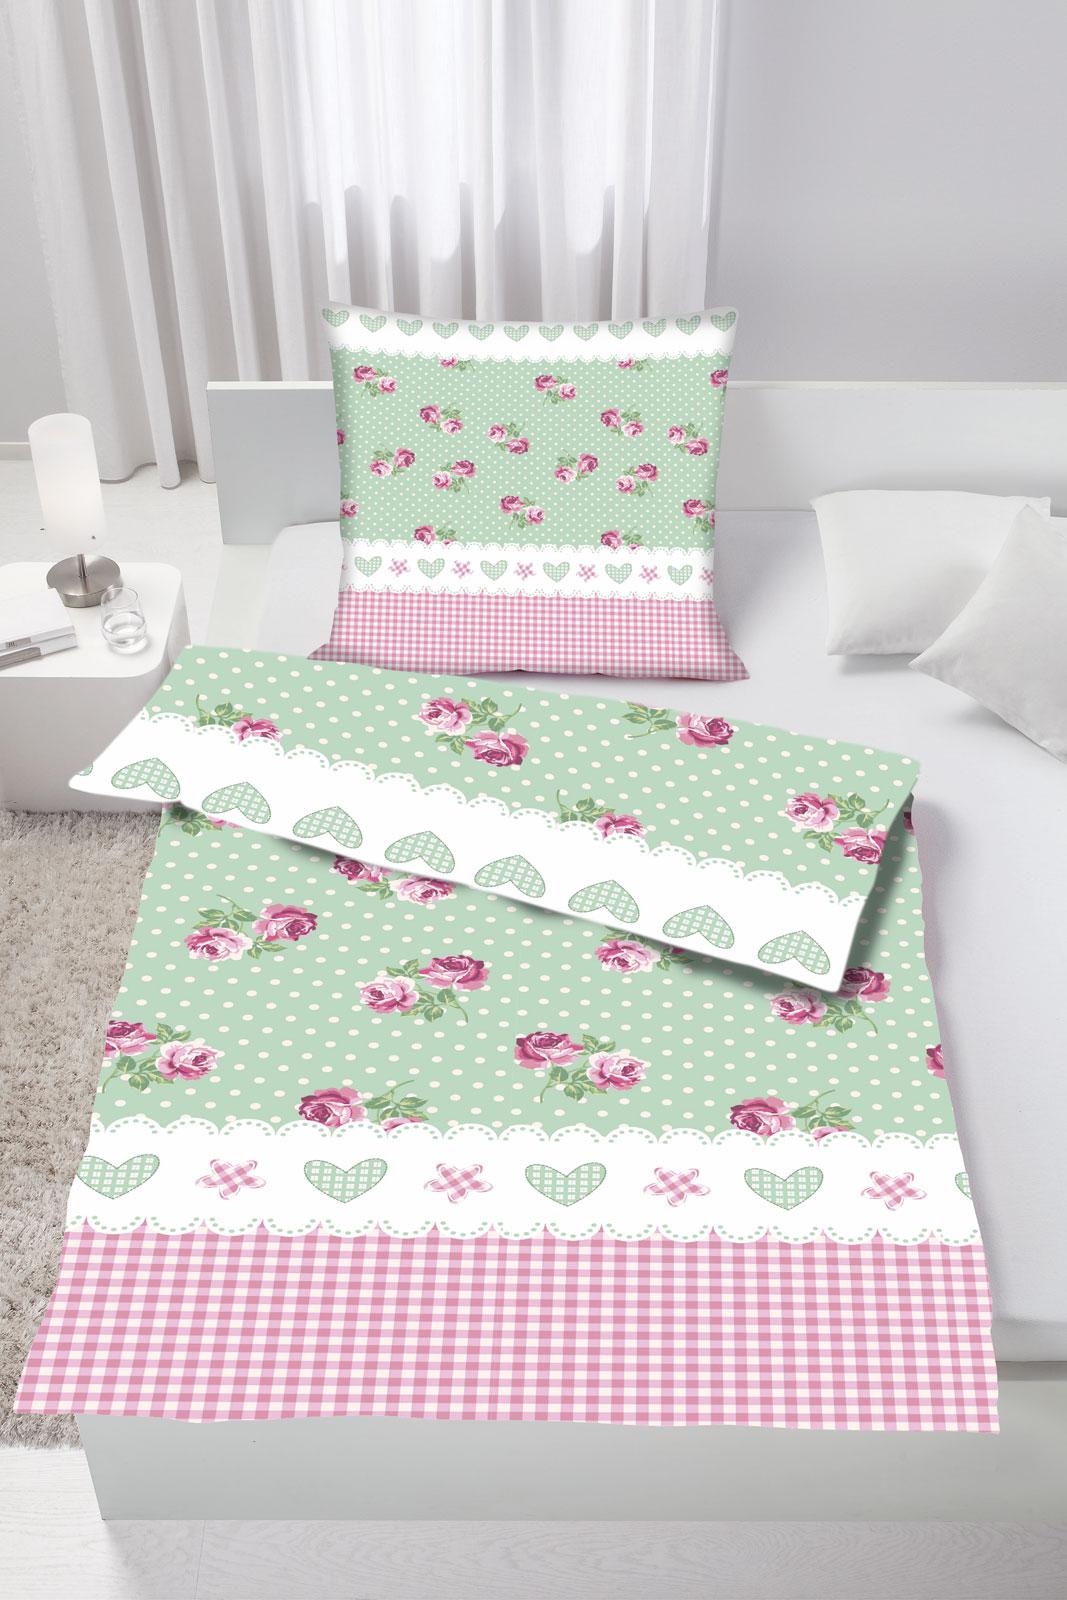 bettw sche renforce 135x200 80x80 art 2302 ebay. Black Bedroom Furniture Sets. Home Design Ideas